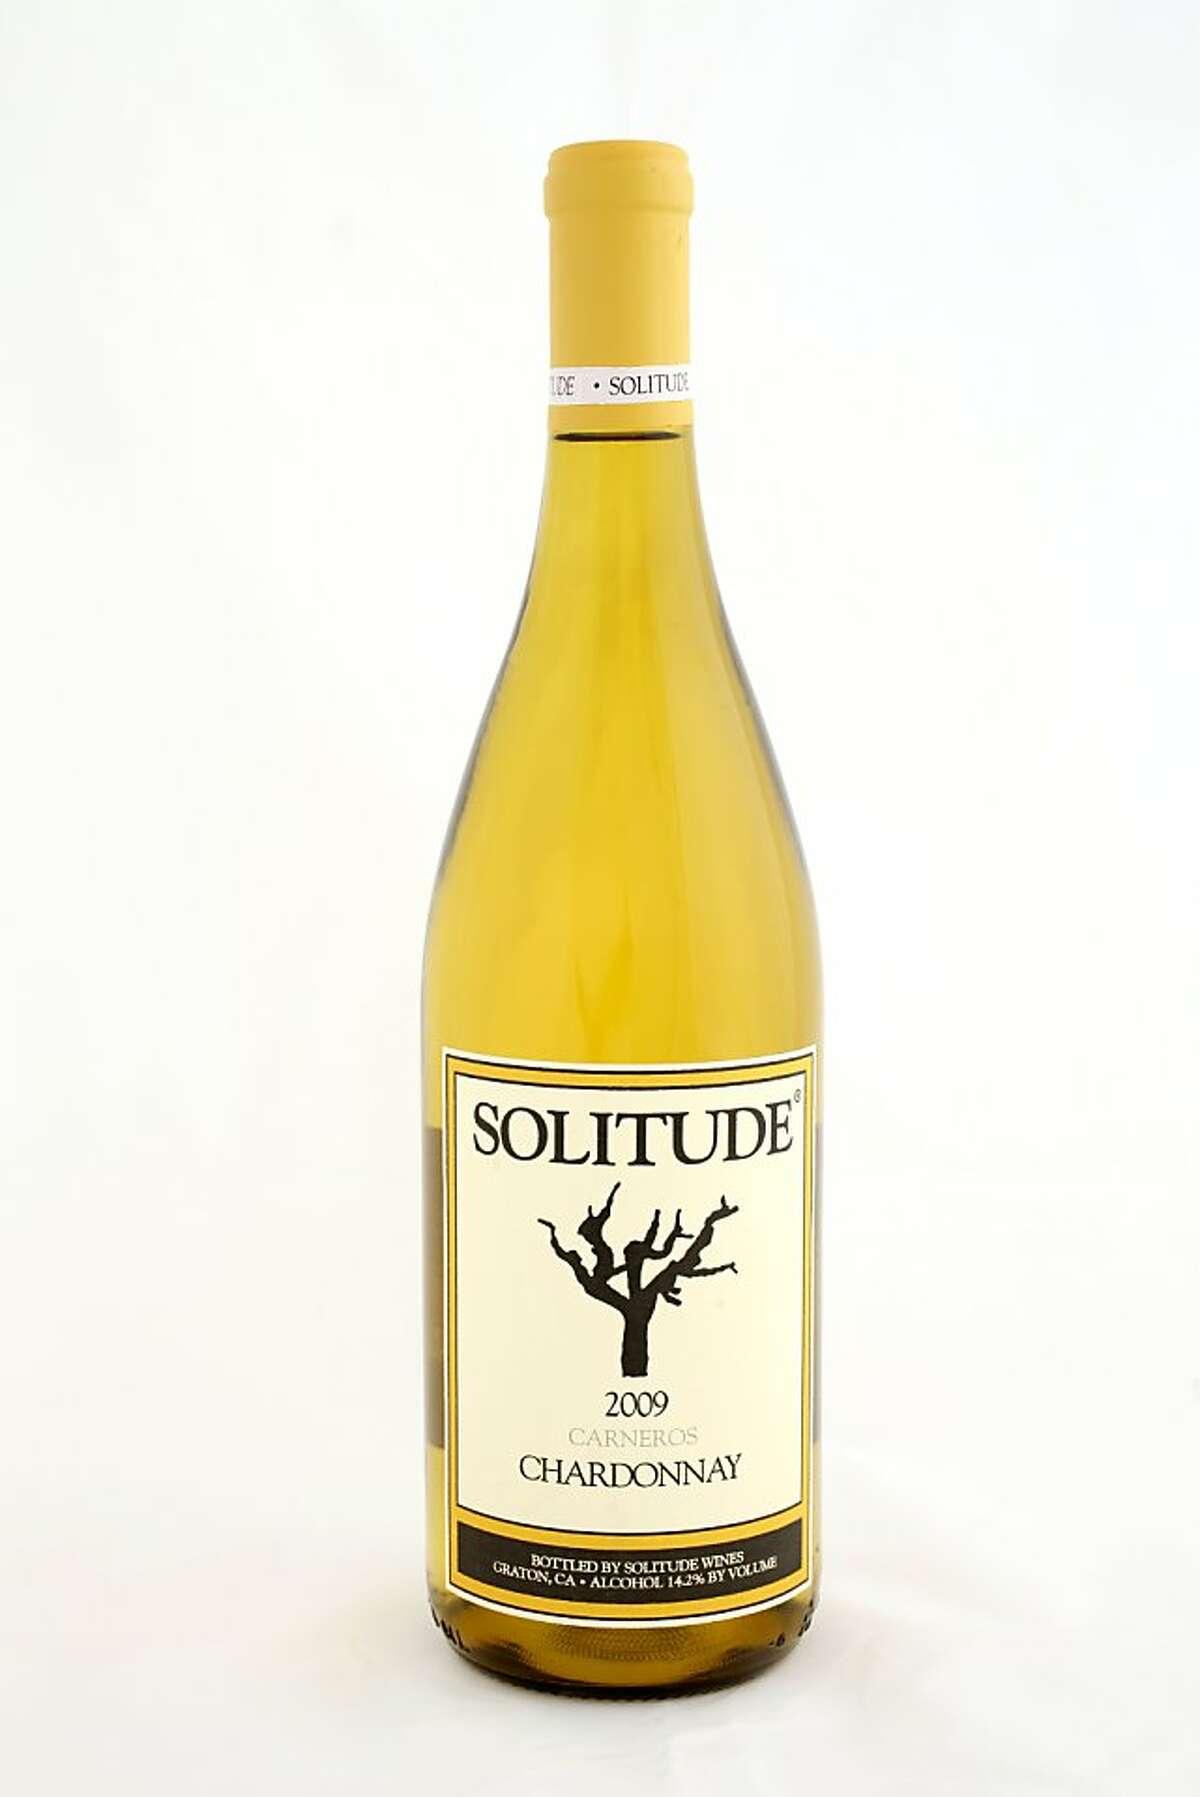 2009 Solitude Wine Carneros Chardonnay